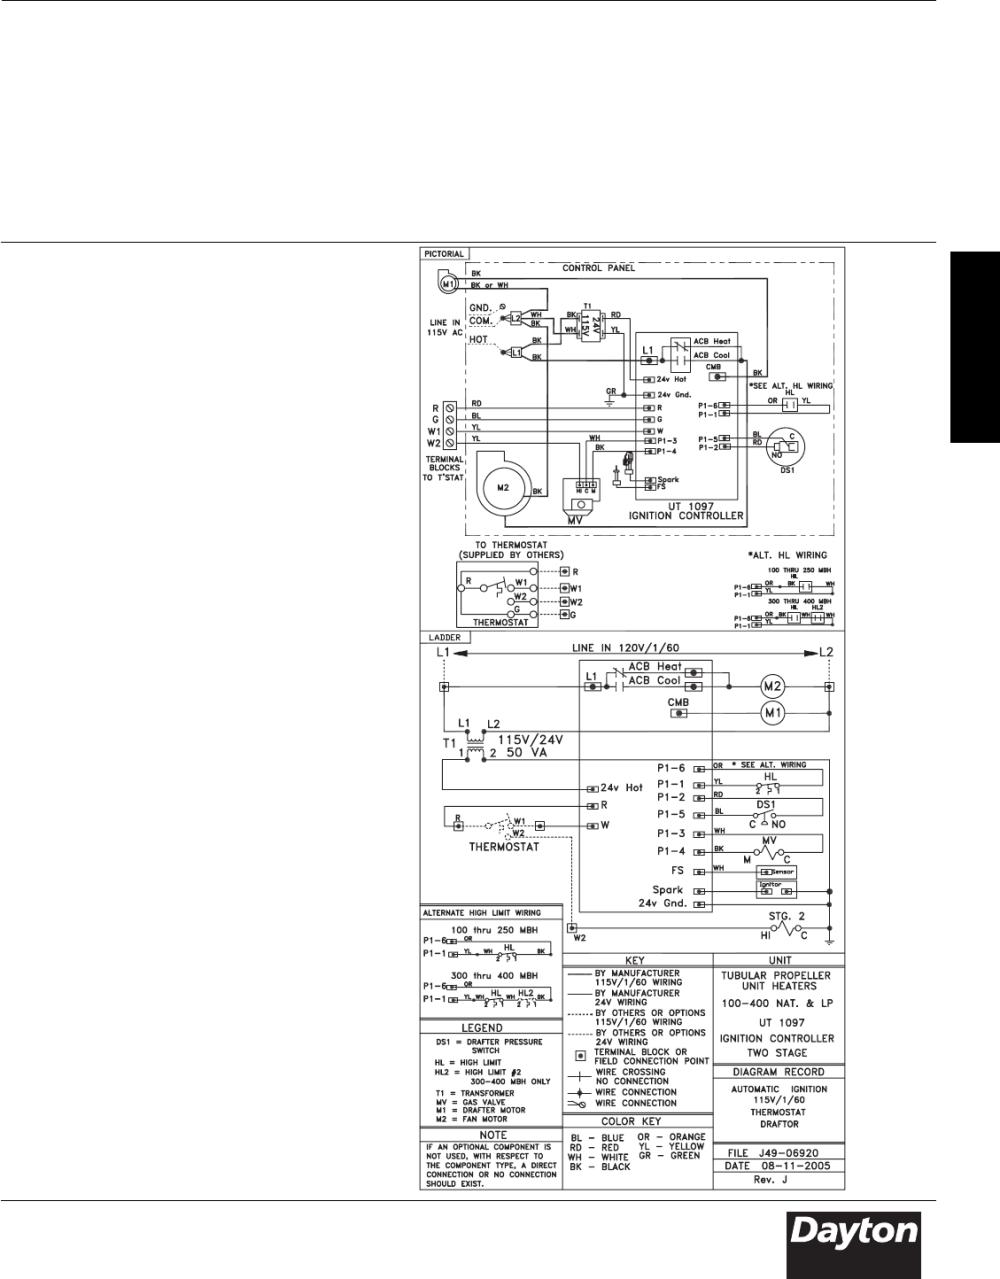 medium resolution of acb wiring fileus navy 090602 n 0557g 006 eabees assigned to 5s5903 721 dayton tubular gas